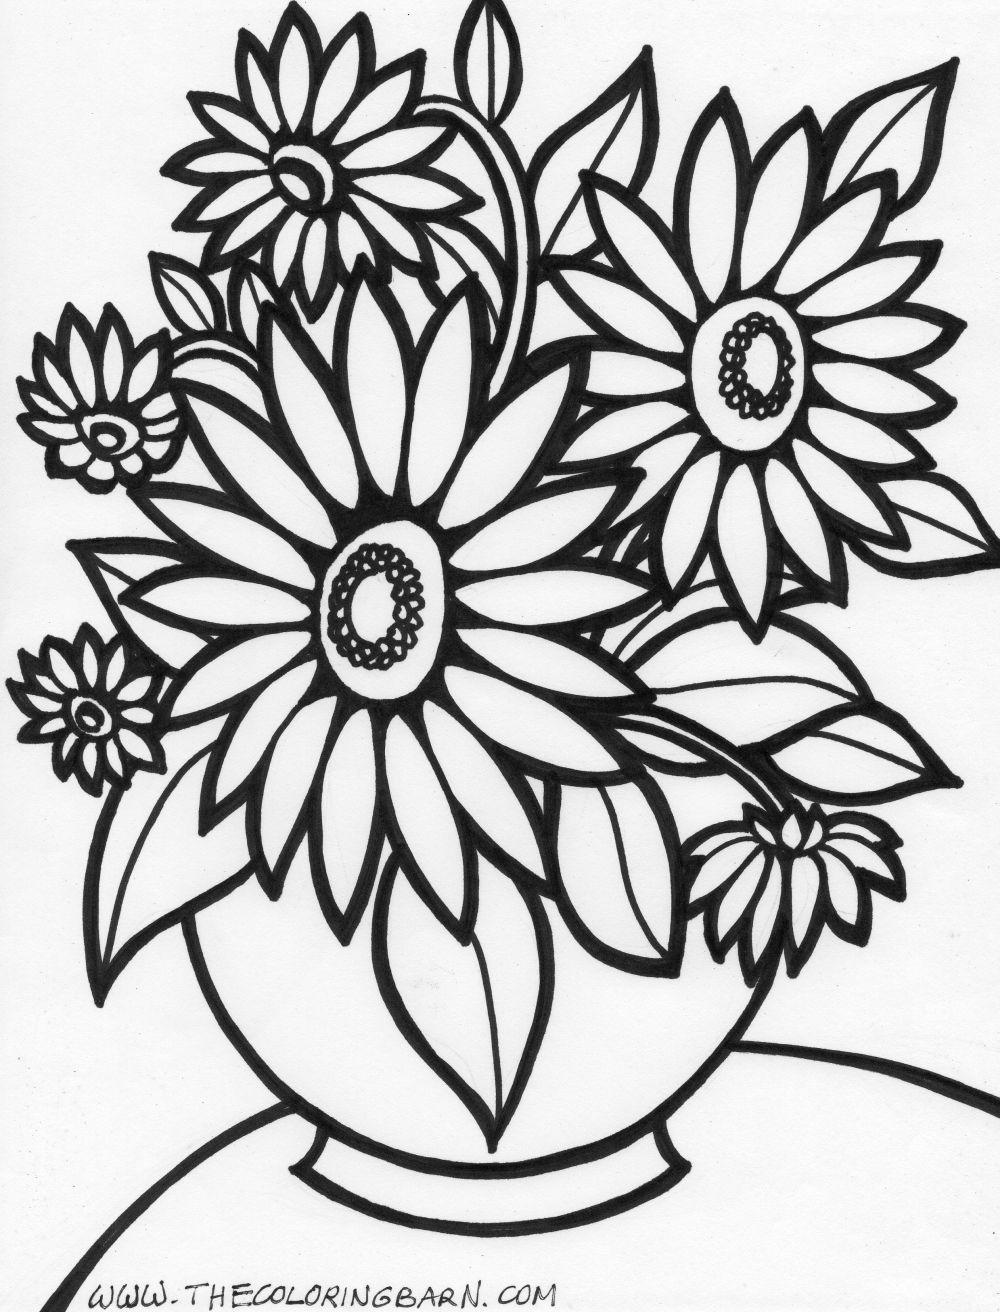 Flower Coloring Pages | Moldes para Imprimir | Pinterest | Molde y ...